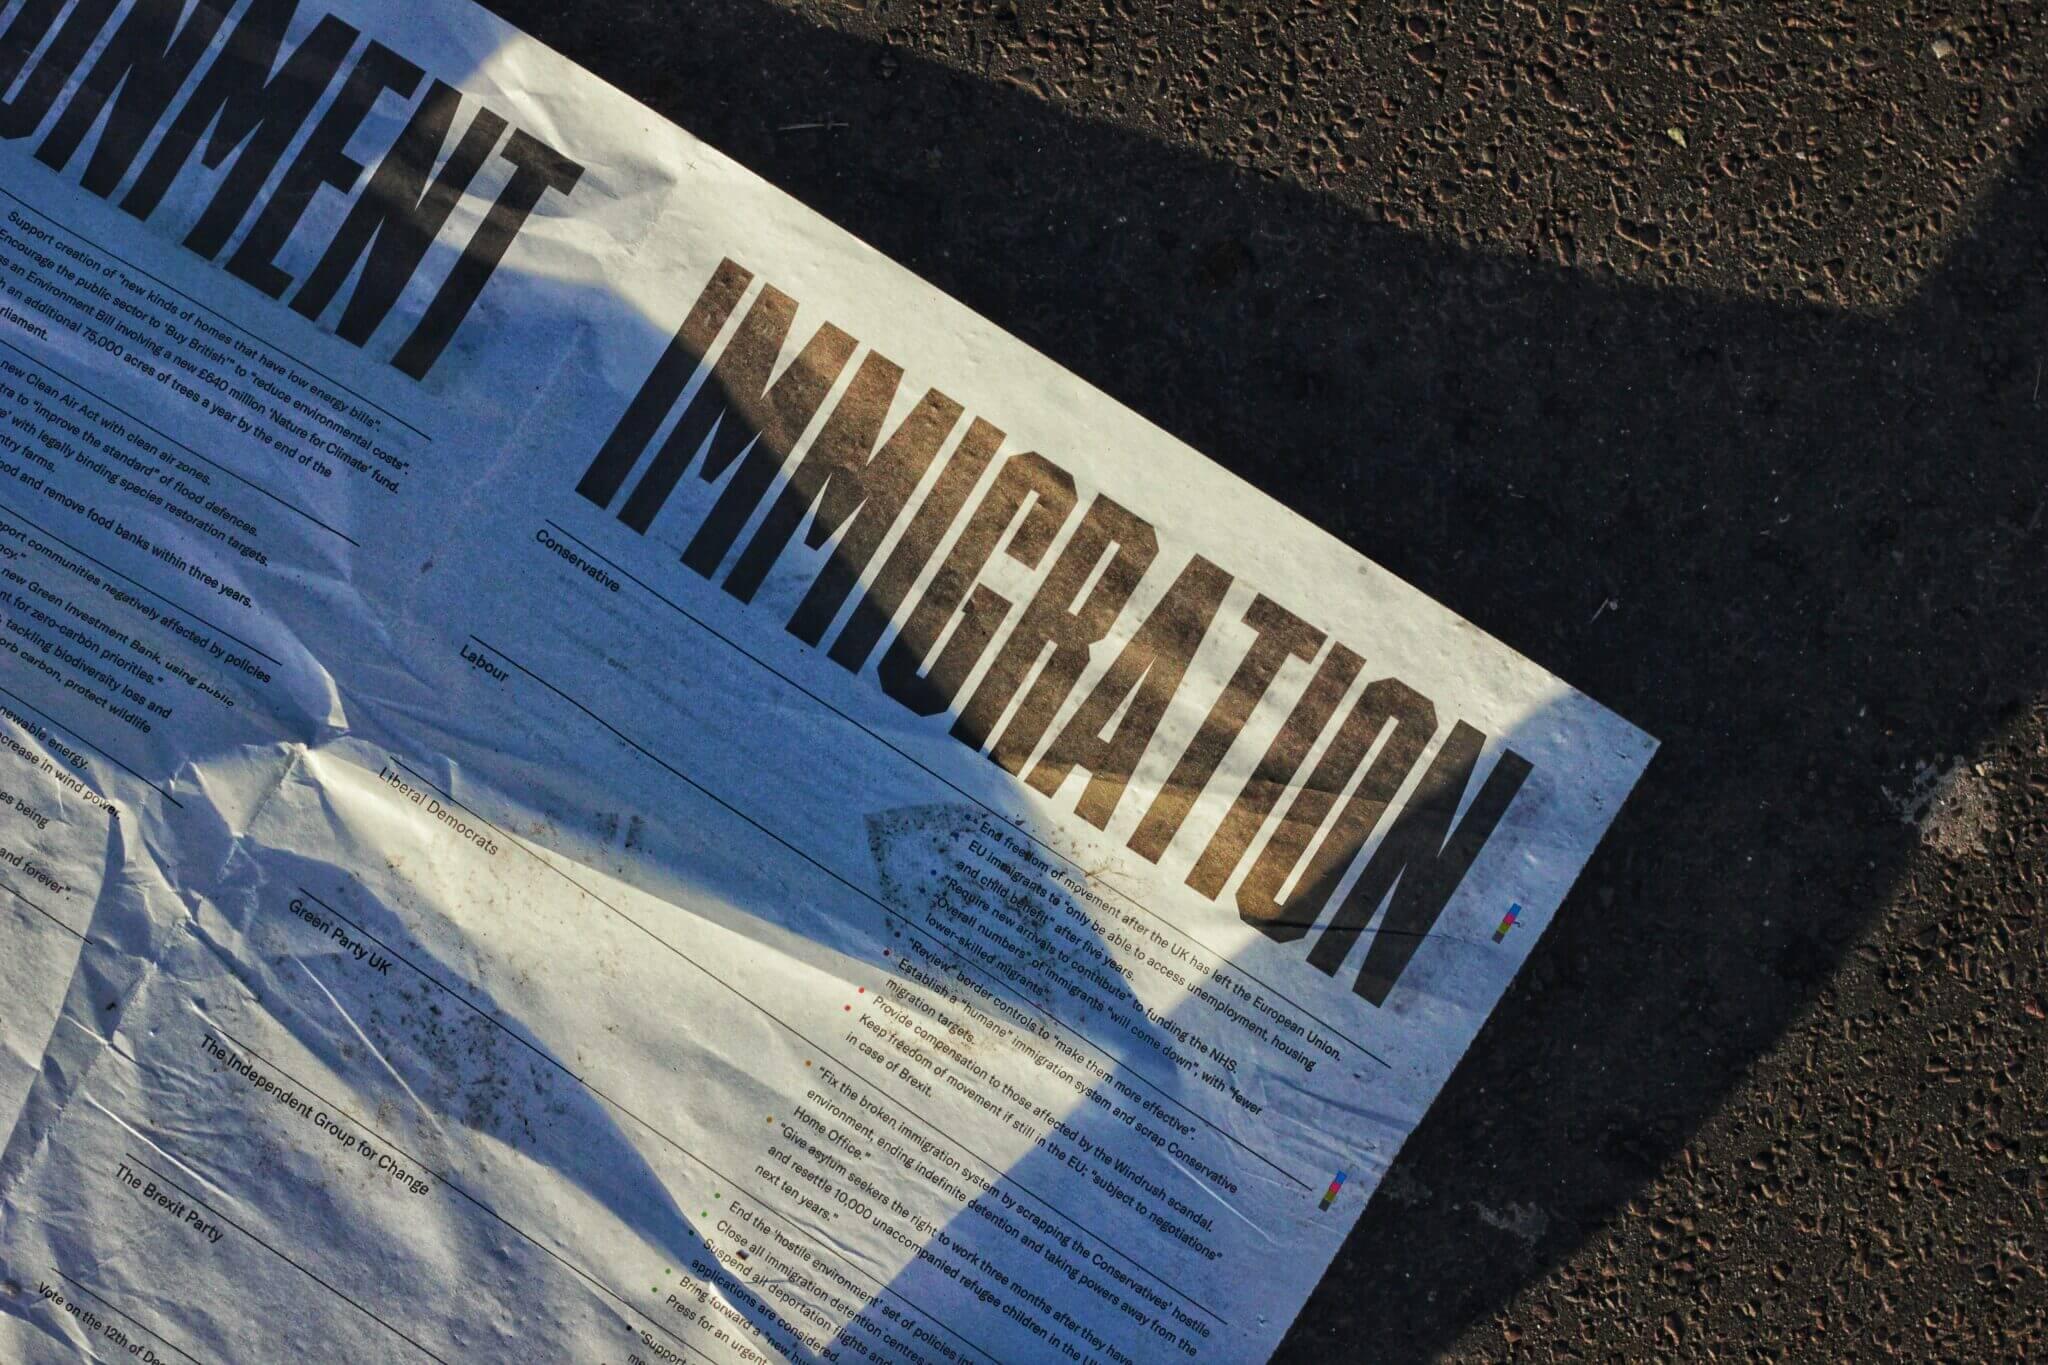 Immigration - Photo by Metin Ozer on Unsplash